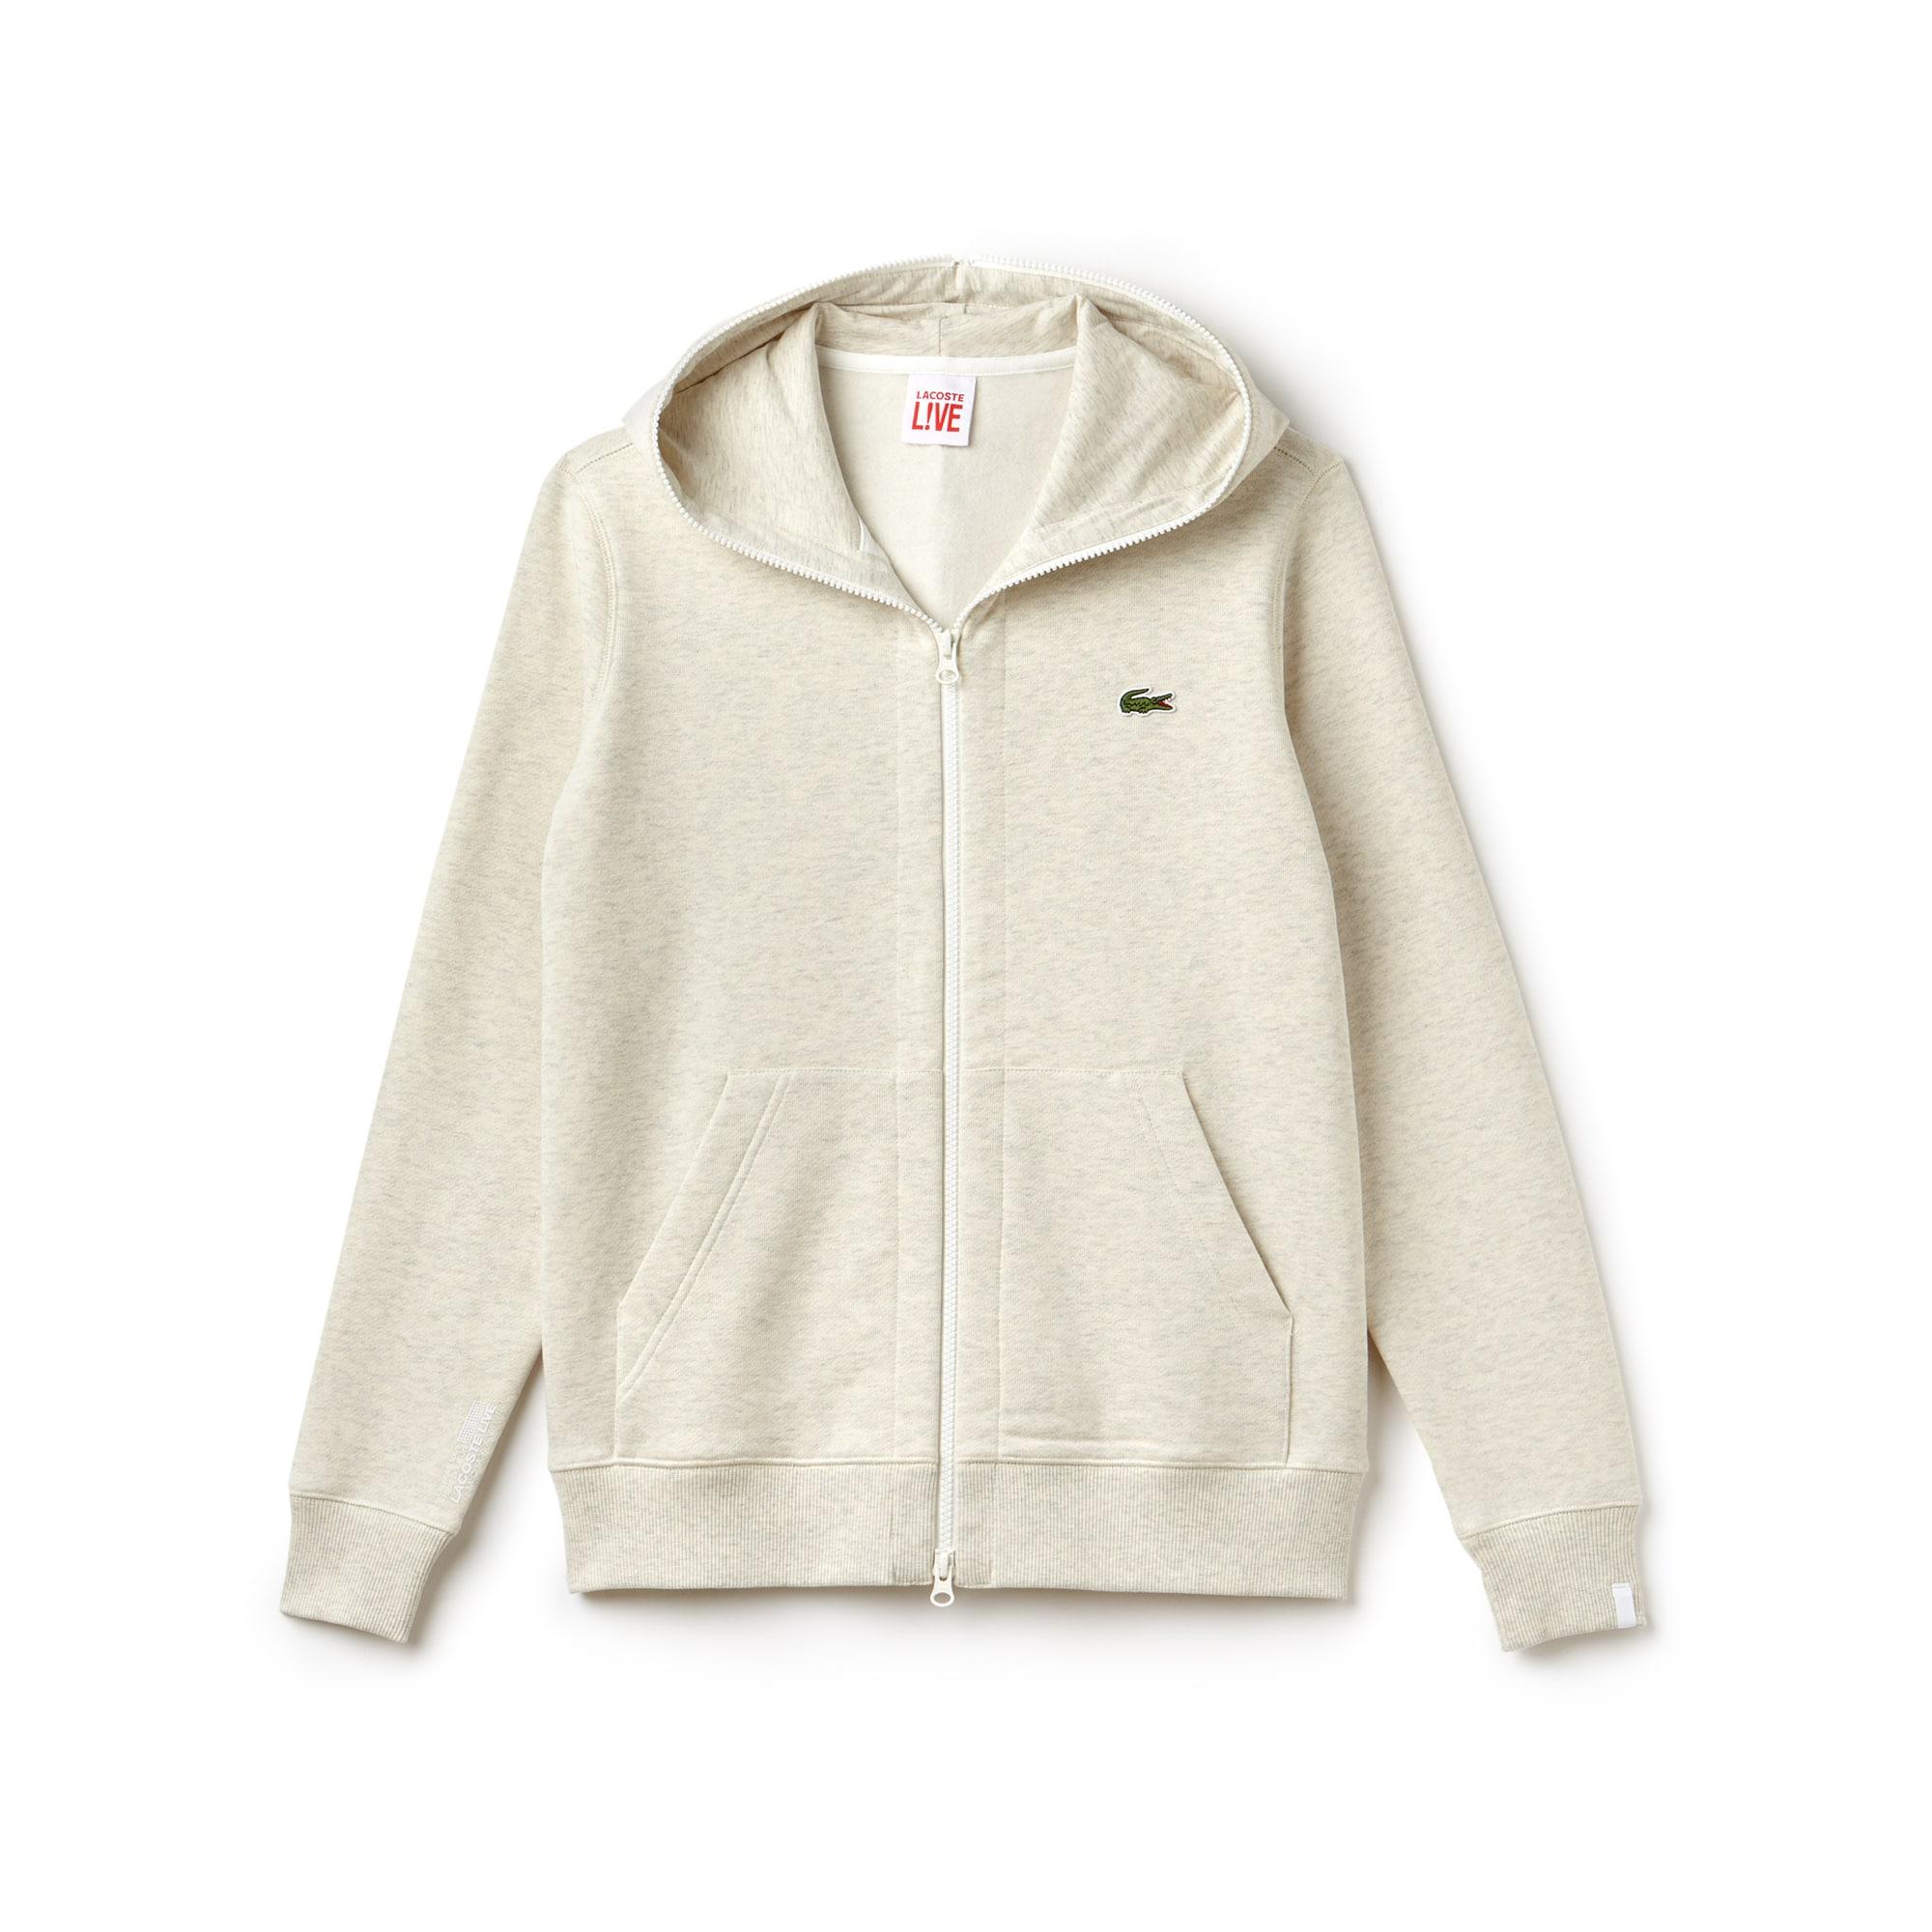 Unisex  LIVE Hooded Zippered Cotton Sweatshirt